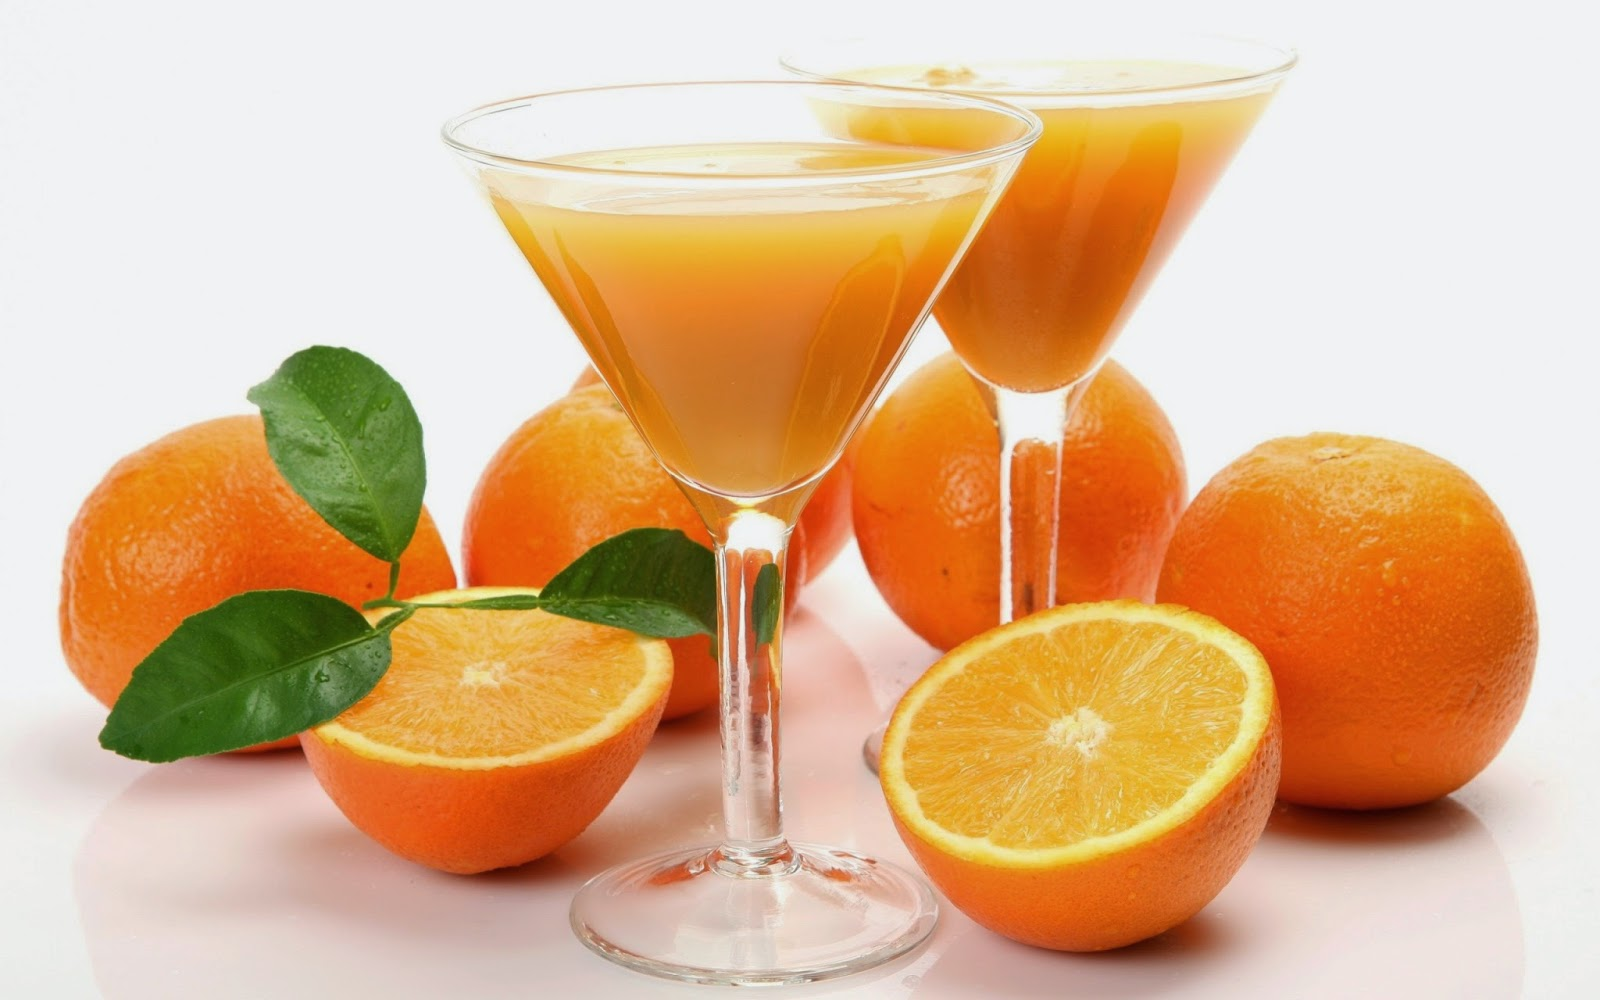 http://1.bp.blogspot.com/-9e3l6pHKuhw/VEWHzxj2NsI/AAAAAAAAHHk/LFN0Fv4l7ro/s1600/orange-juice.jpg